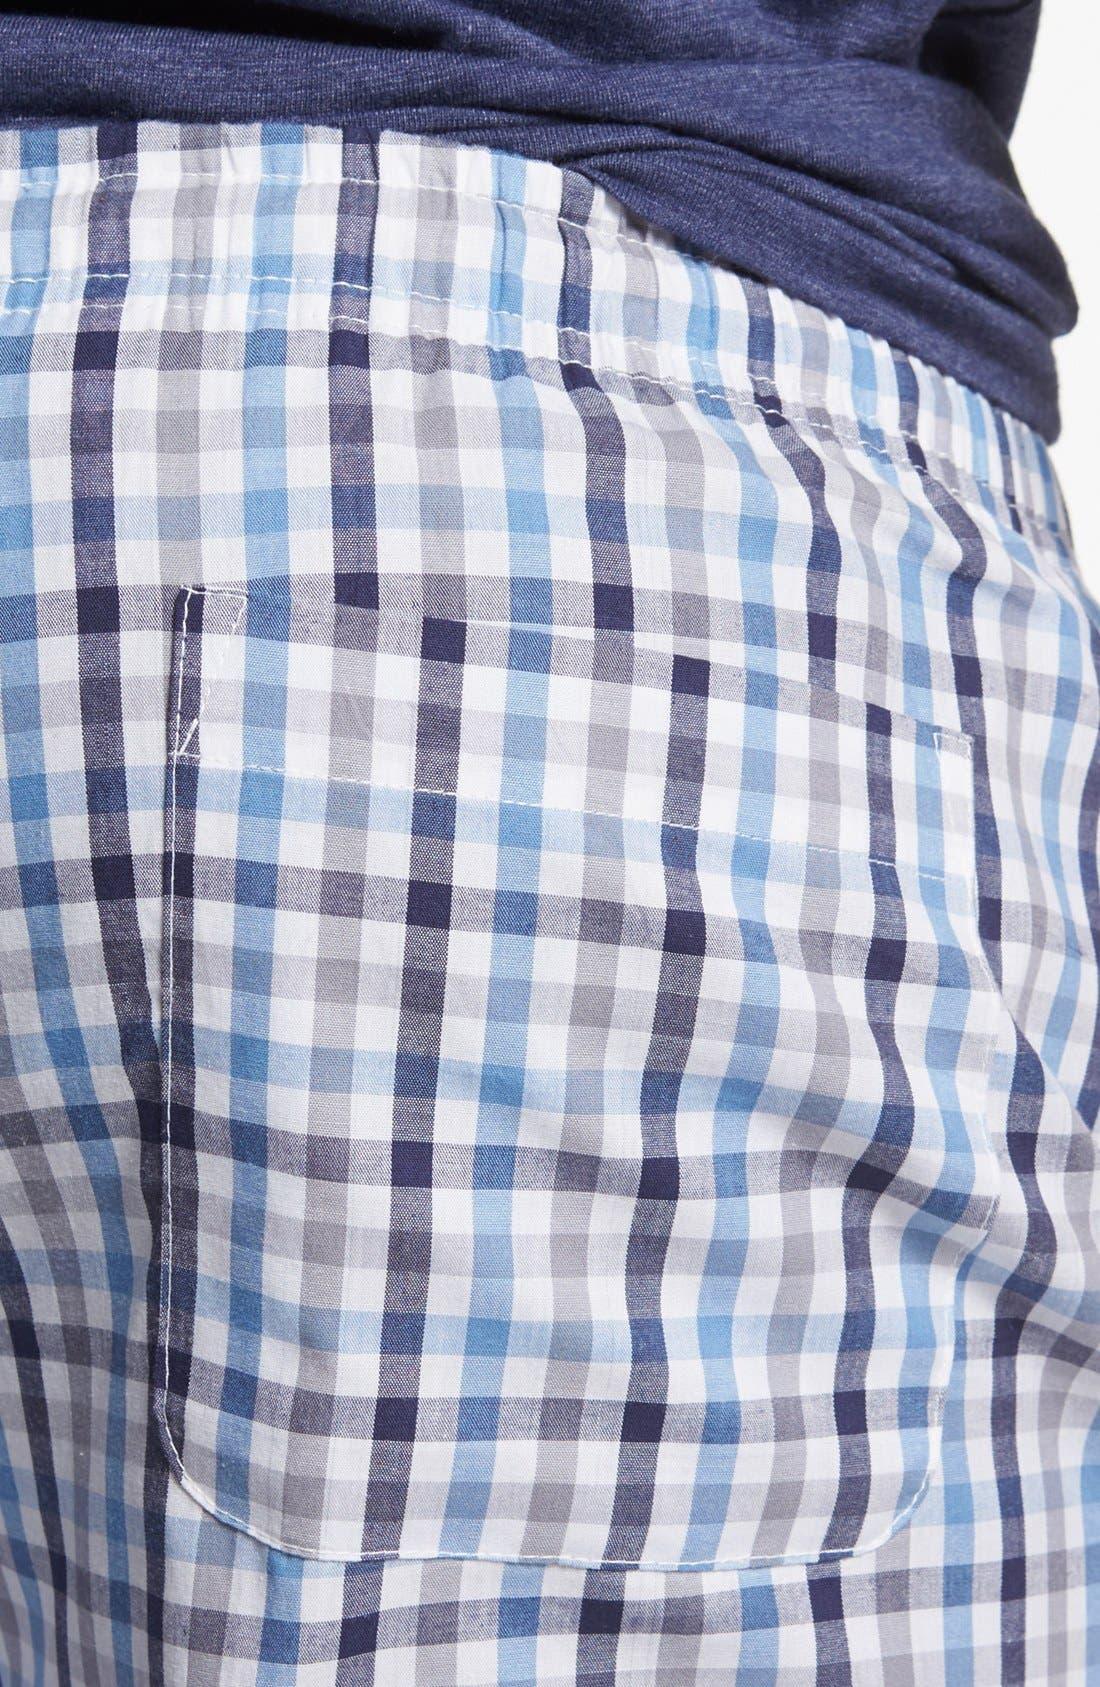 Alternate Image 3  - Majestic International 'Vintage' Pajamas (Big)